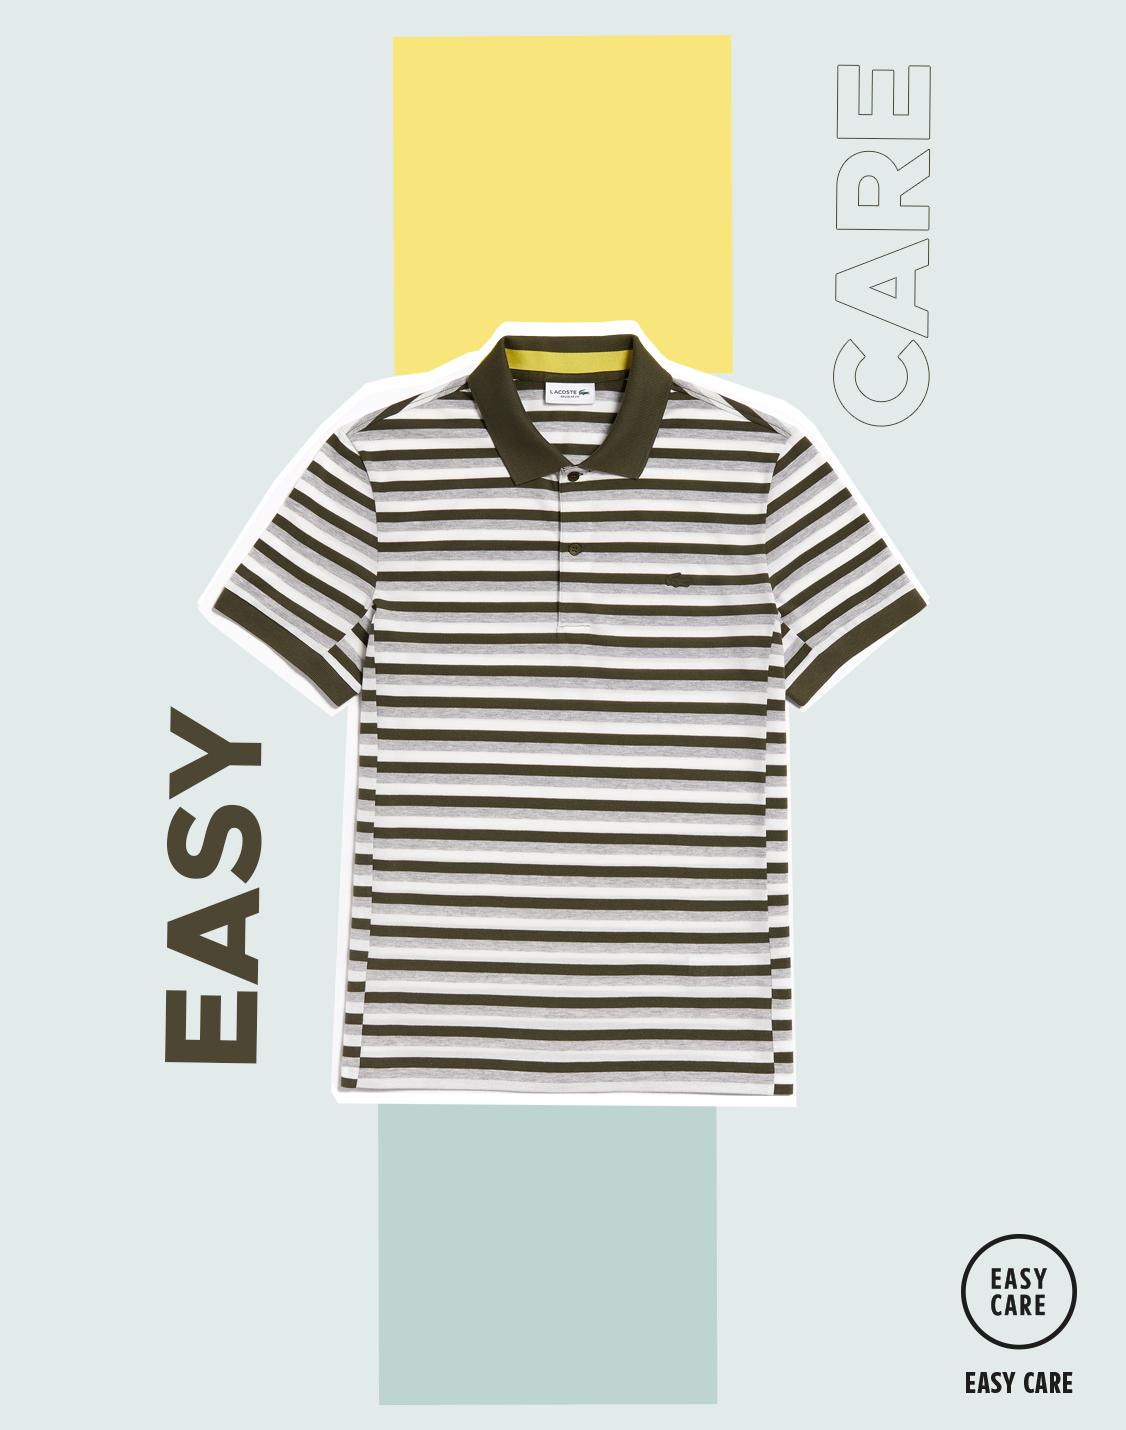 Easy Care: Materiale anti-piega